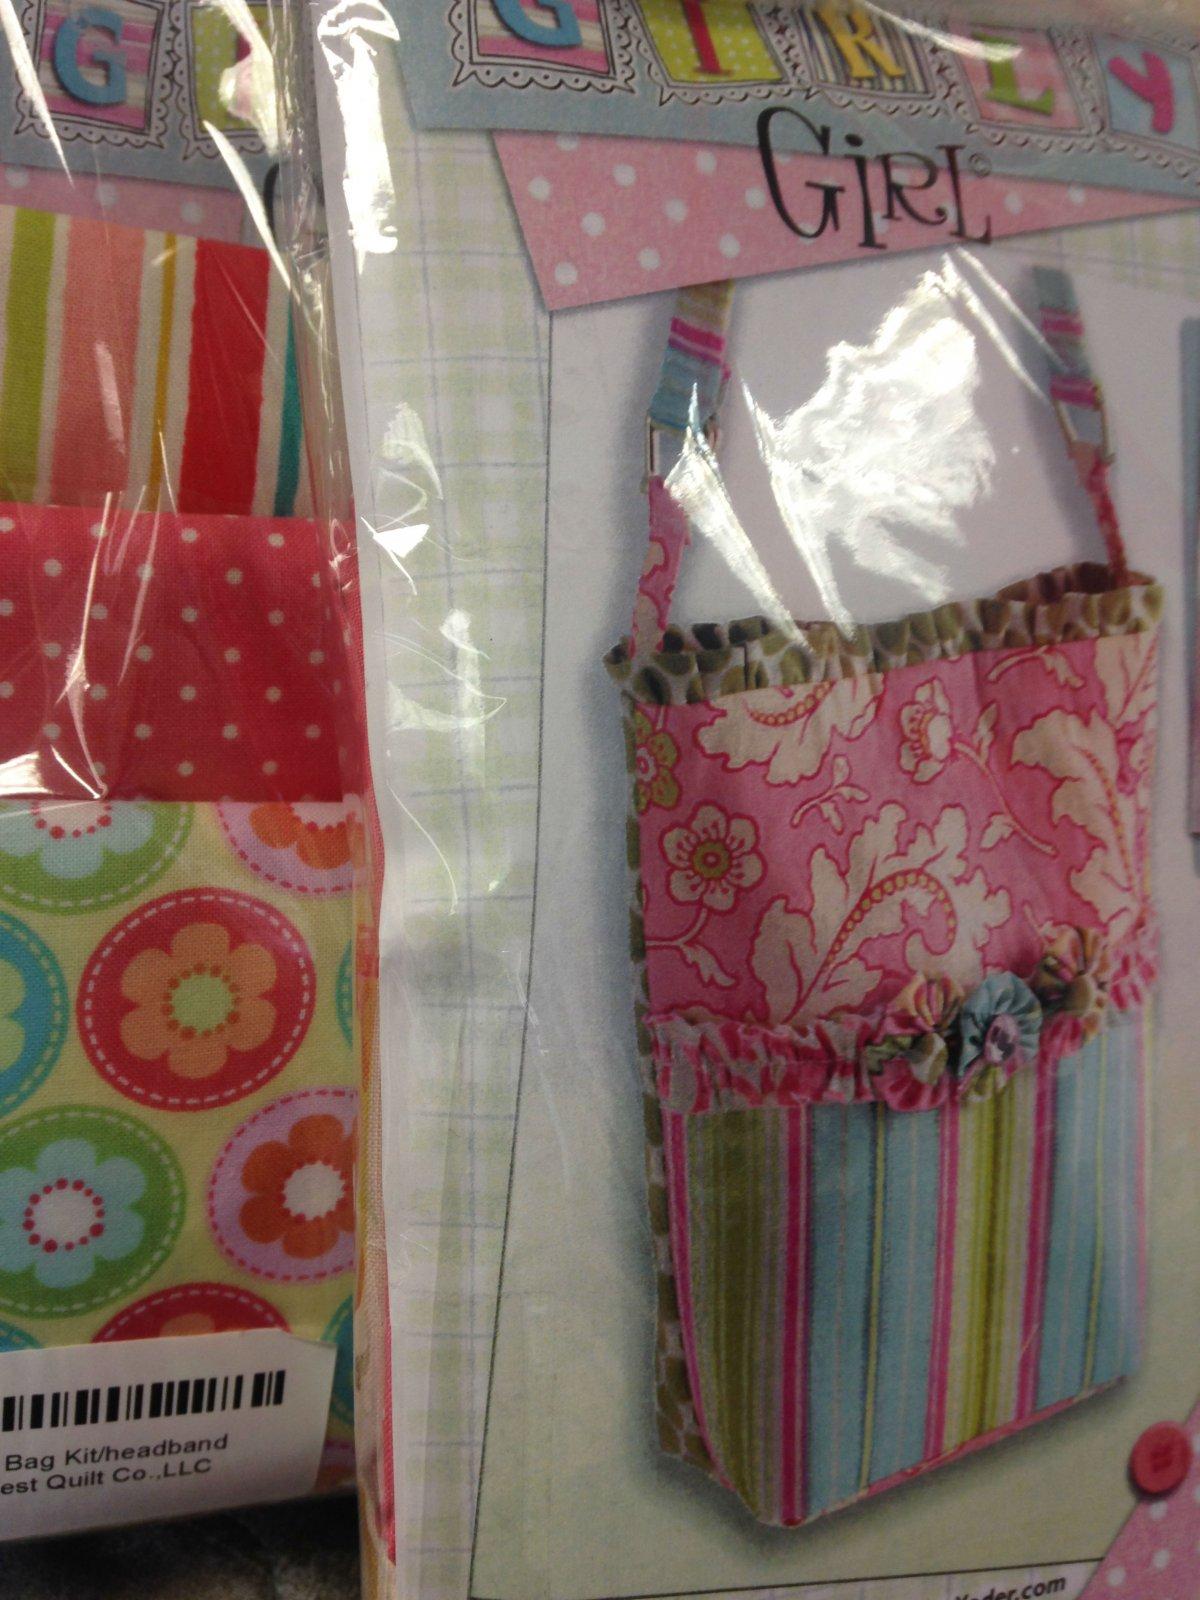 Girly Girl Bag Kit/headband